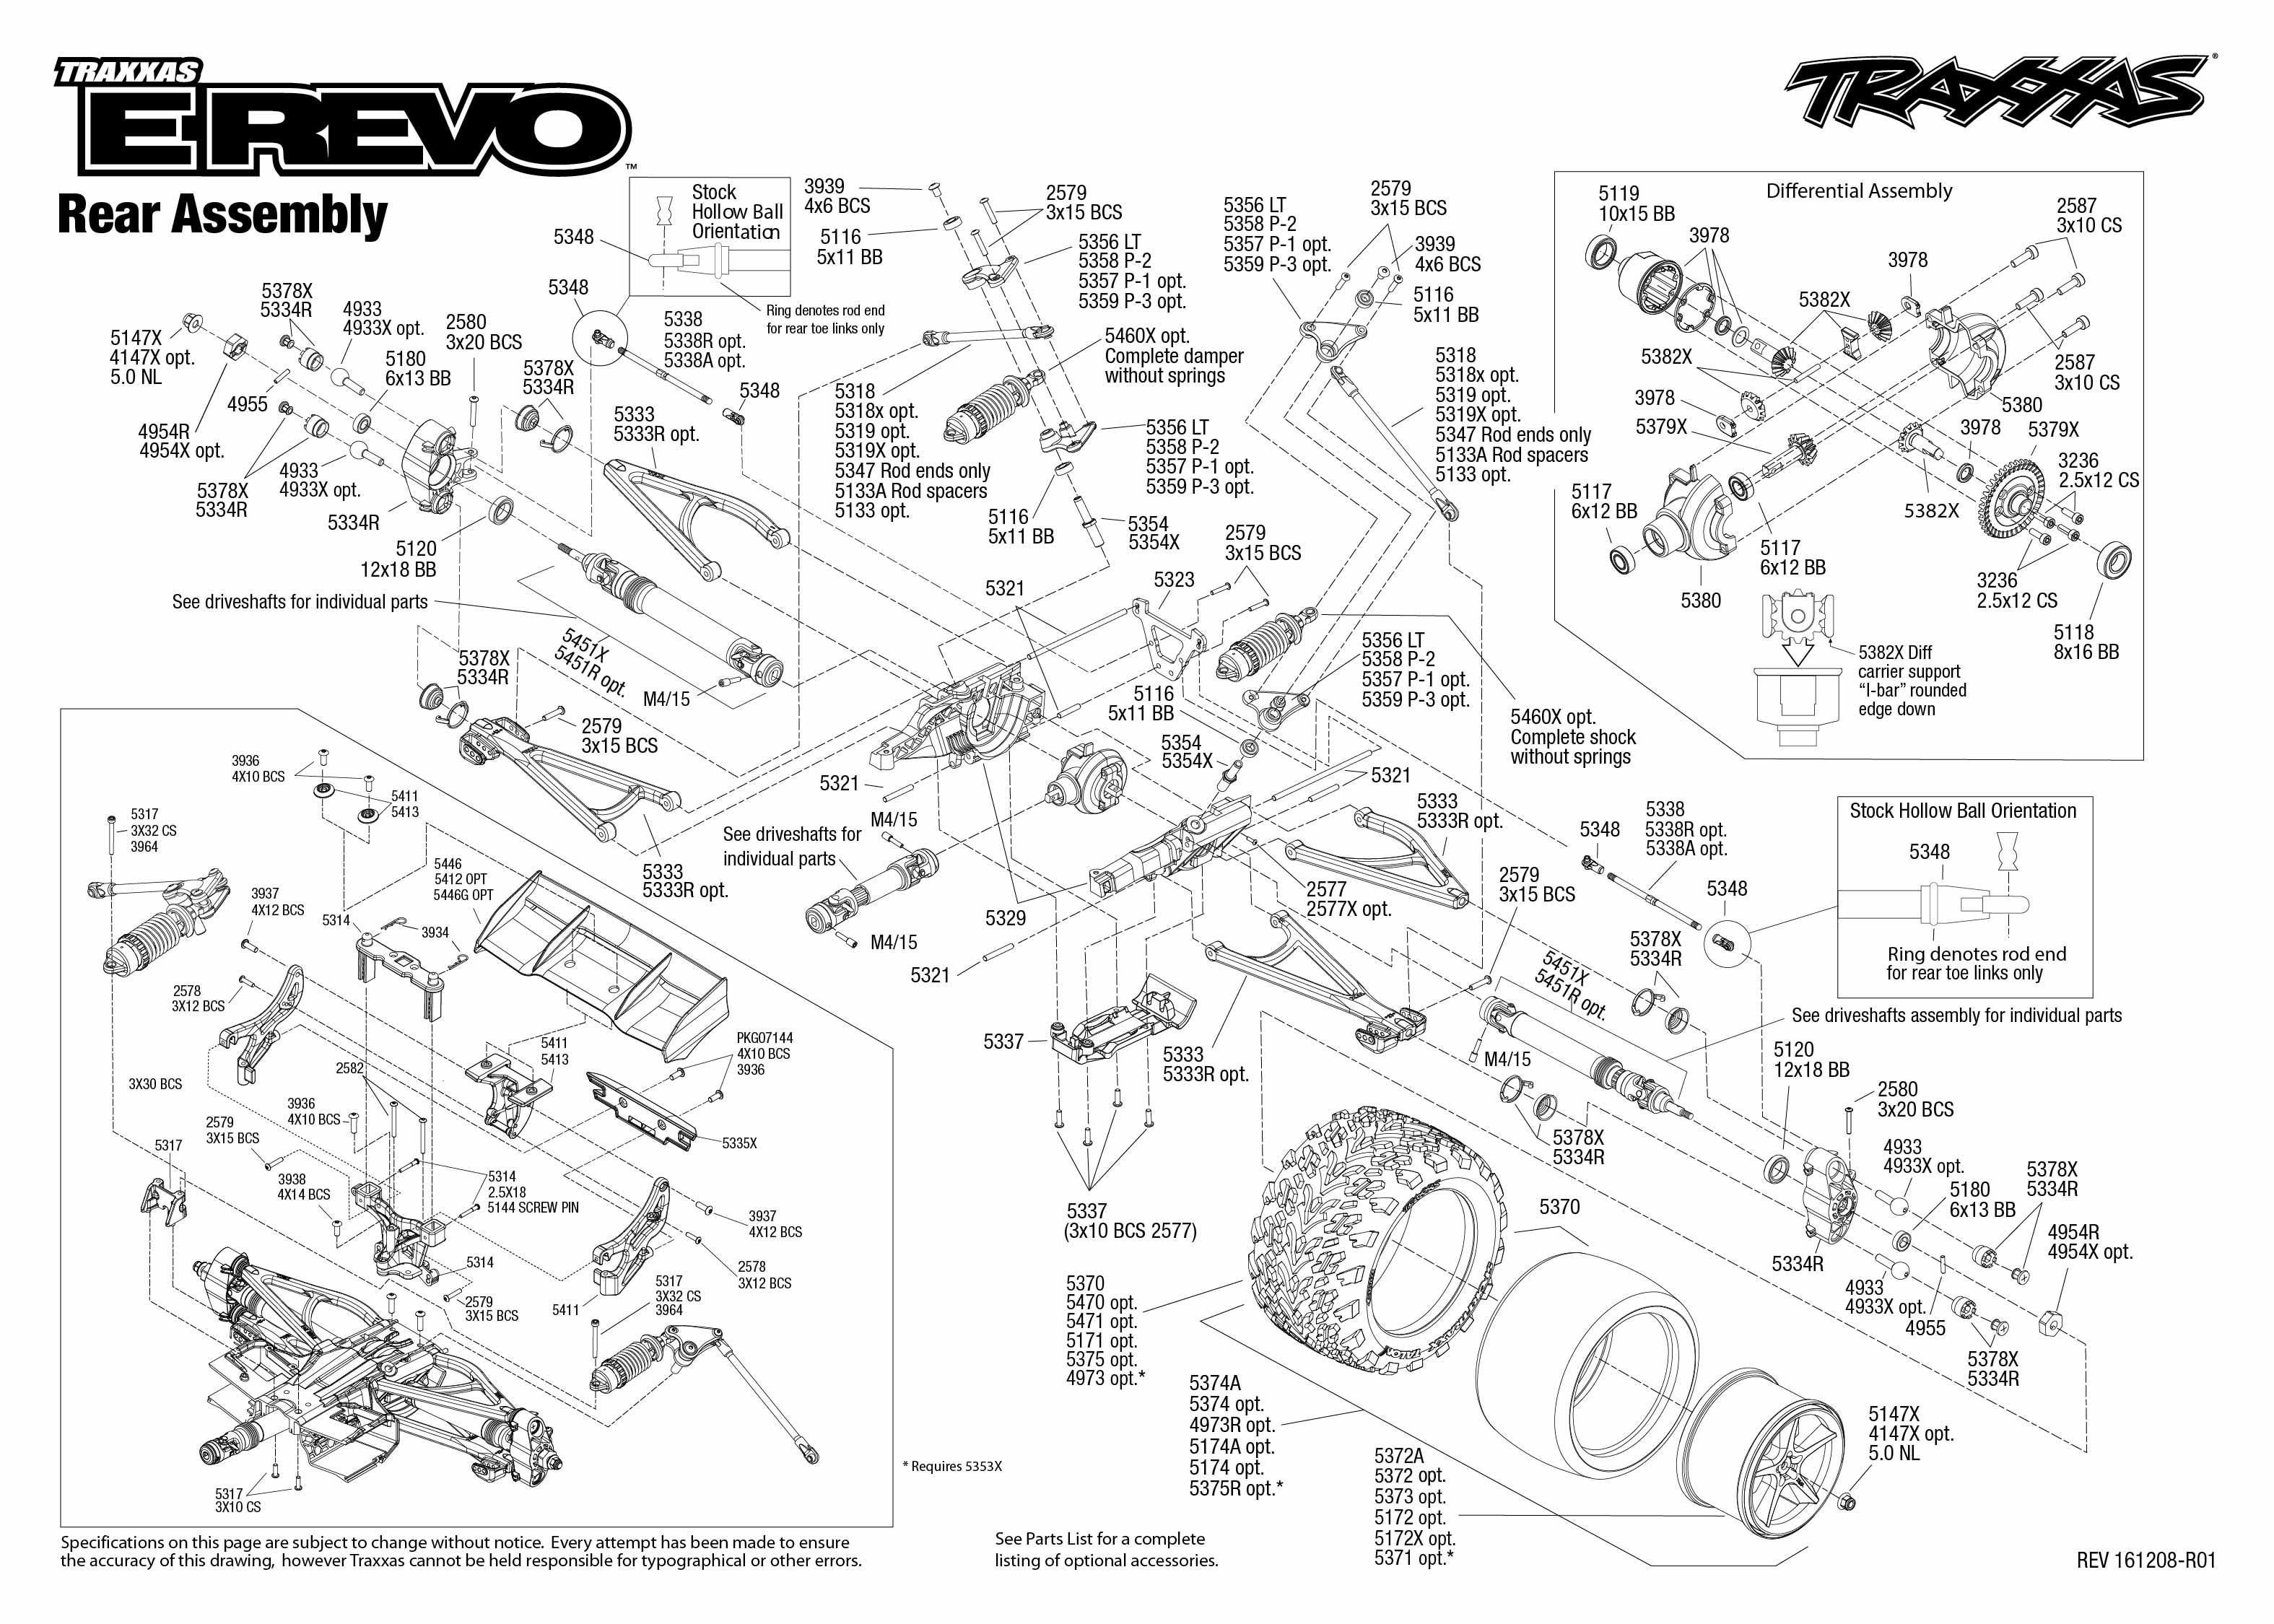 E revo diagram new wiring diagram 2018 exploded view traxxas e revo 1 10 tqi bluetooth ready tsm rtr be traxxas 1 16 e revo with traxxas lights rc body shells for traxxas 18 e revo 1 10 e revo pooptronica